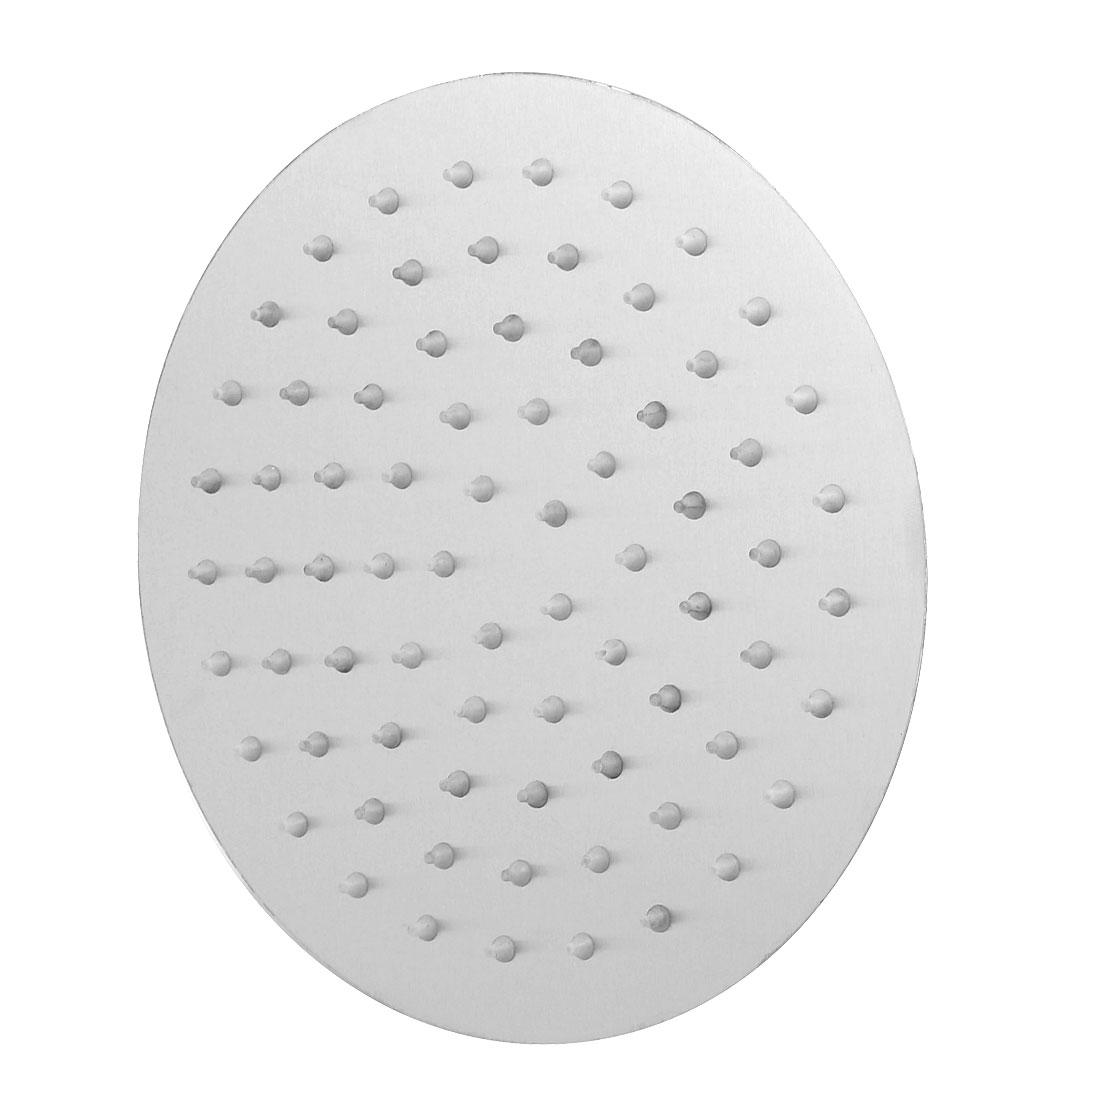 Bathroom 304 Stainless Steel Round Top Spray Shower Bathing Head Silver Tone